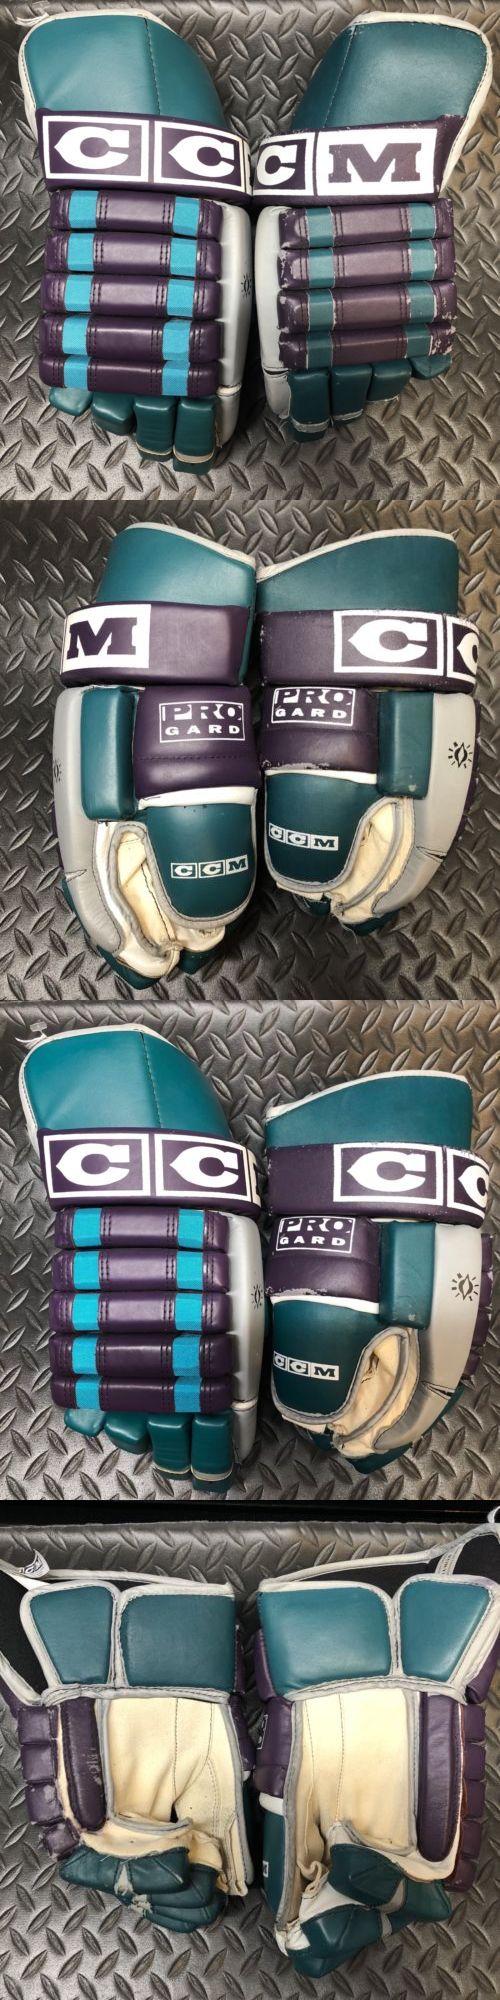 eb57f4e01b9 Gloves 20853  Pro Stock Ccm Hockey Gloves Mighty Ducks Of Anaheim Mismatch  -  BUY